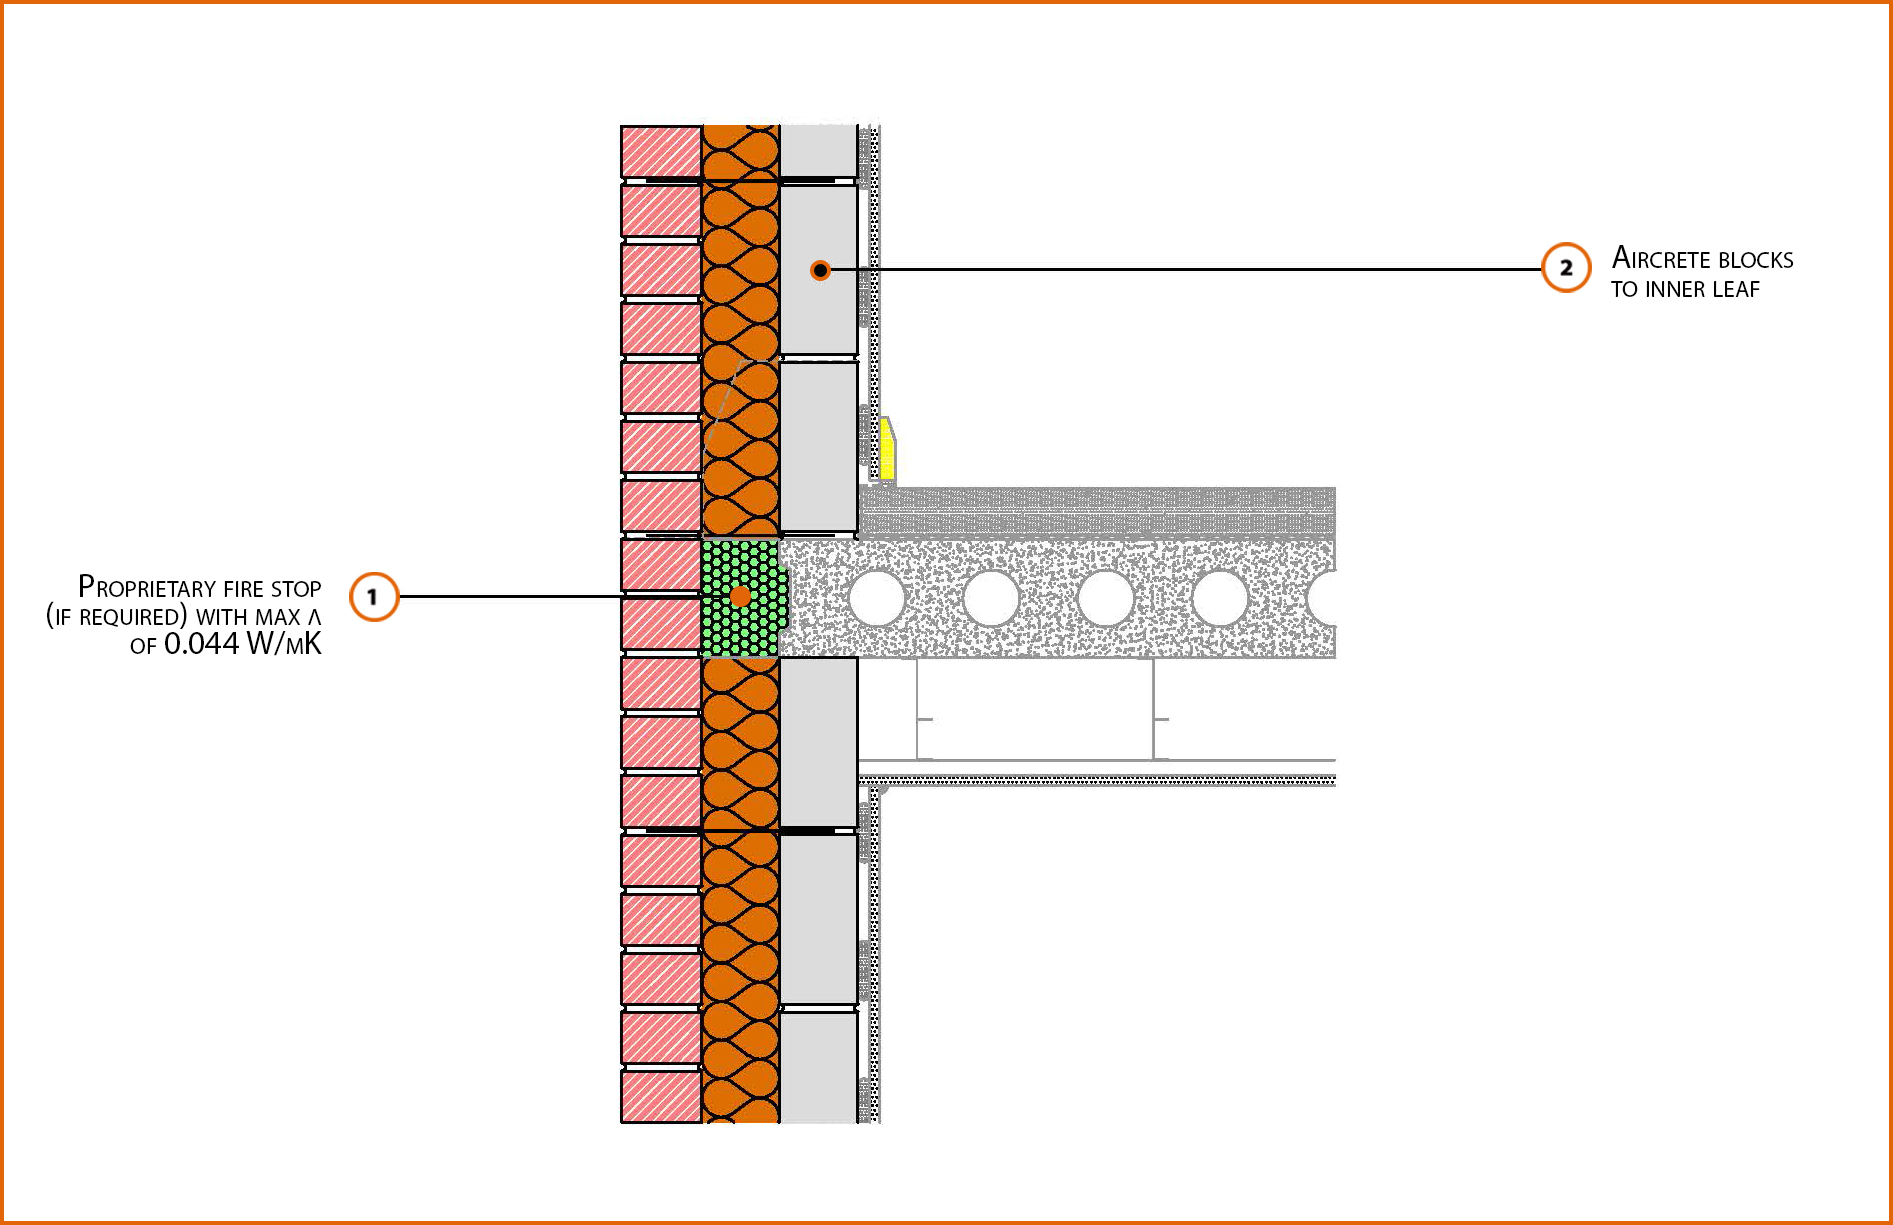 E7mcff5 Precast Concrete Separating Floor Between